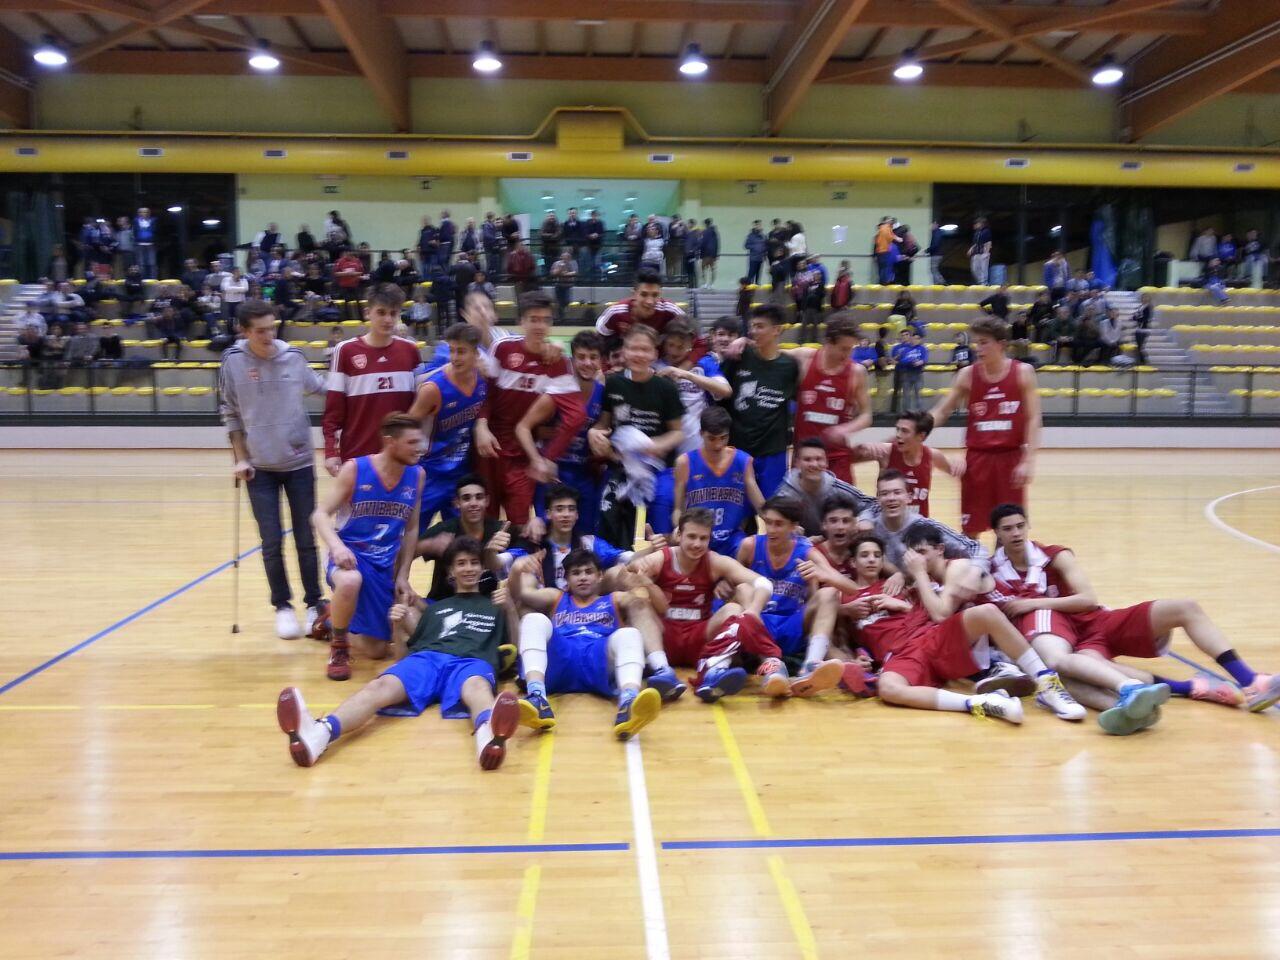 Torneo Giovani Leggende: Varese è più forte, Vivi Basket lotta